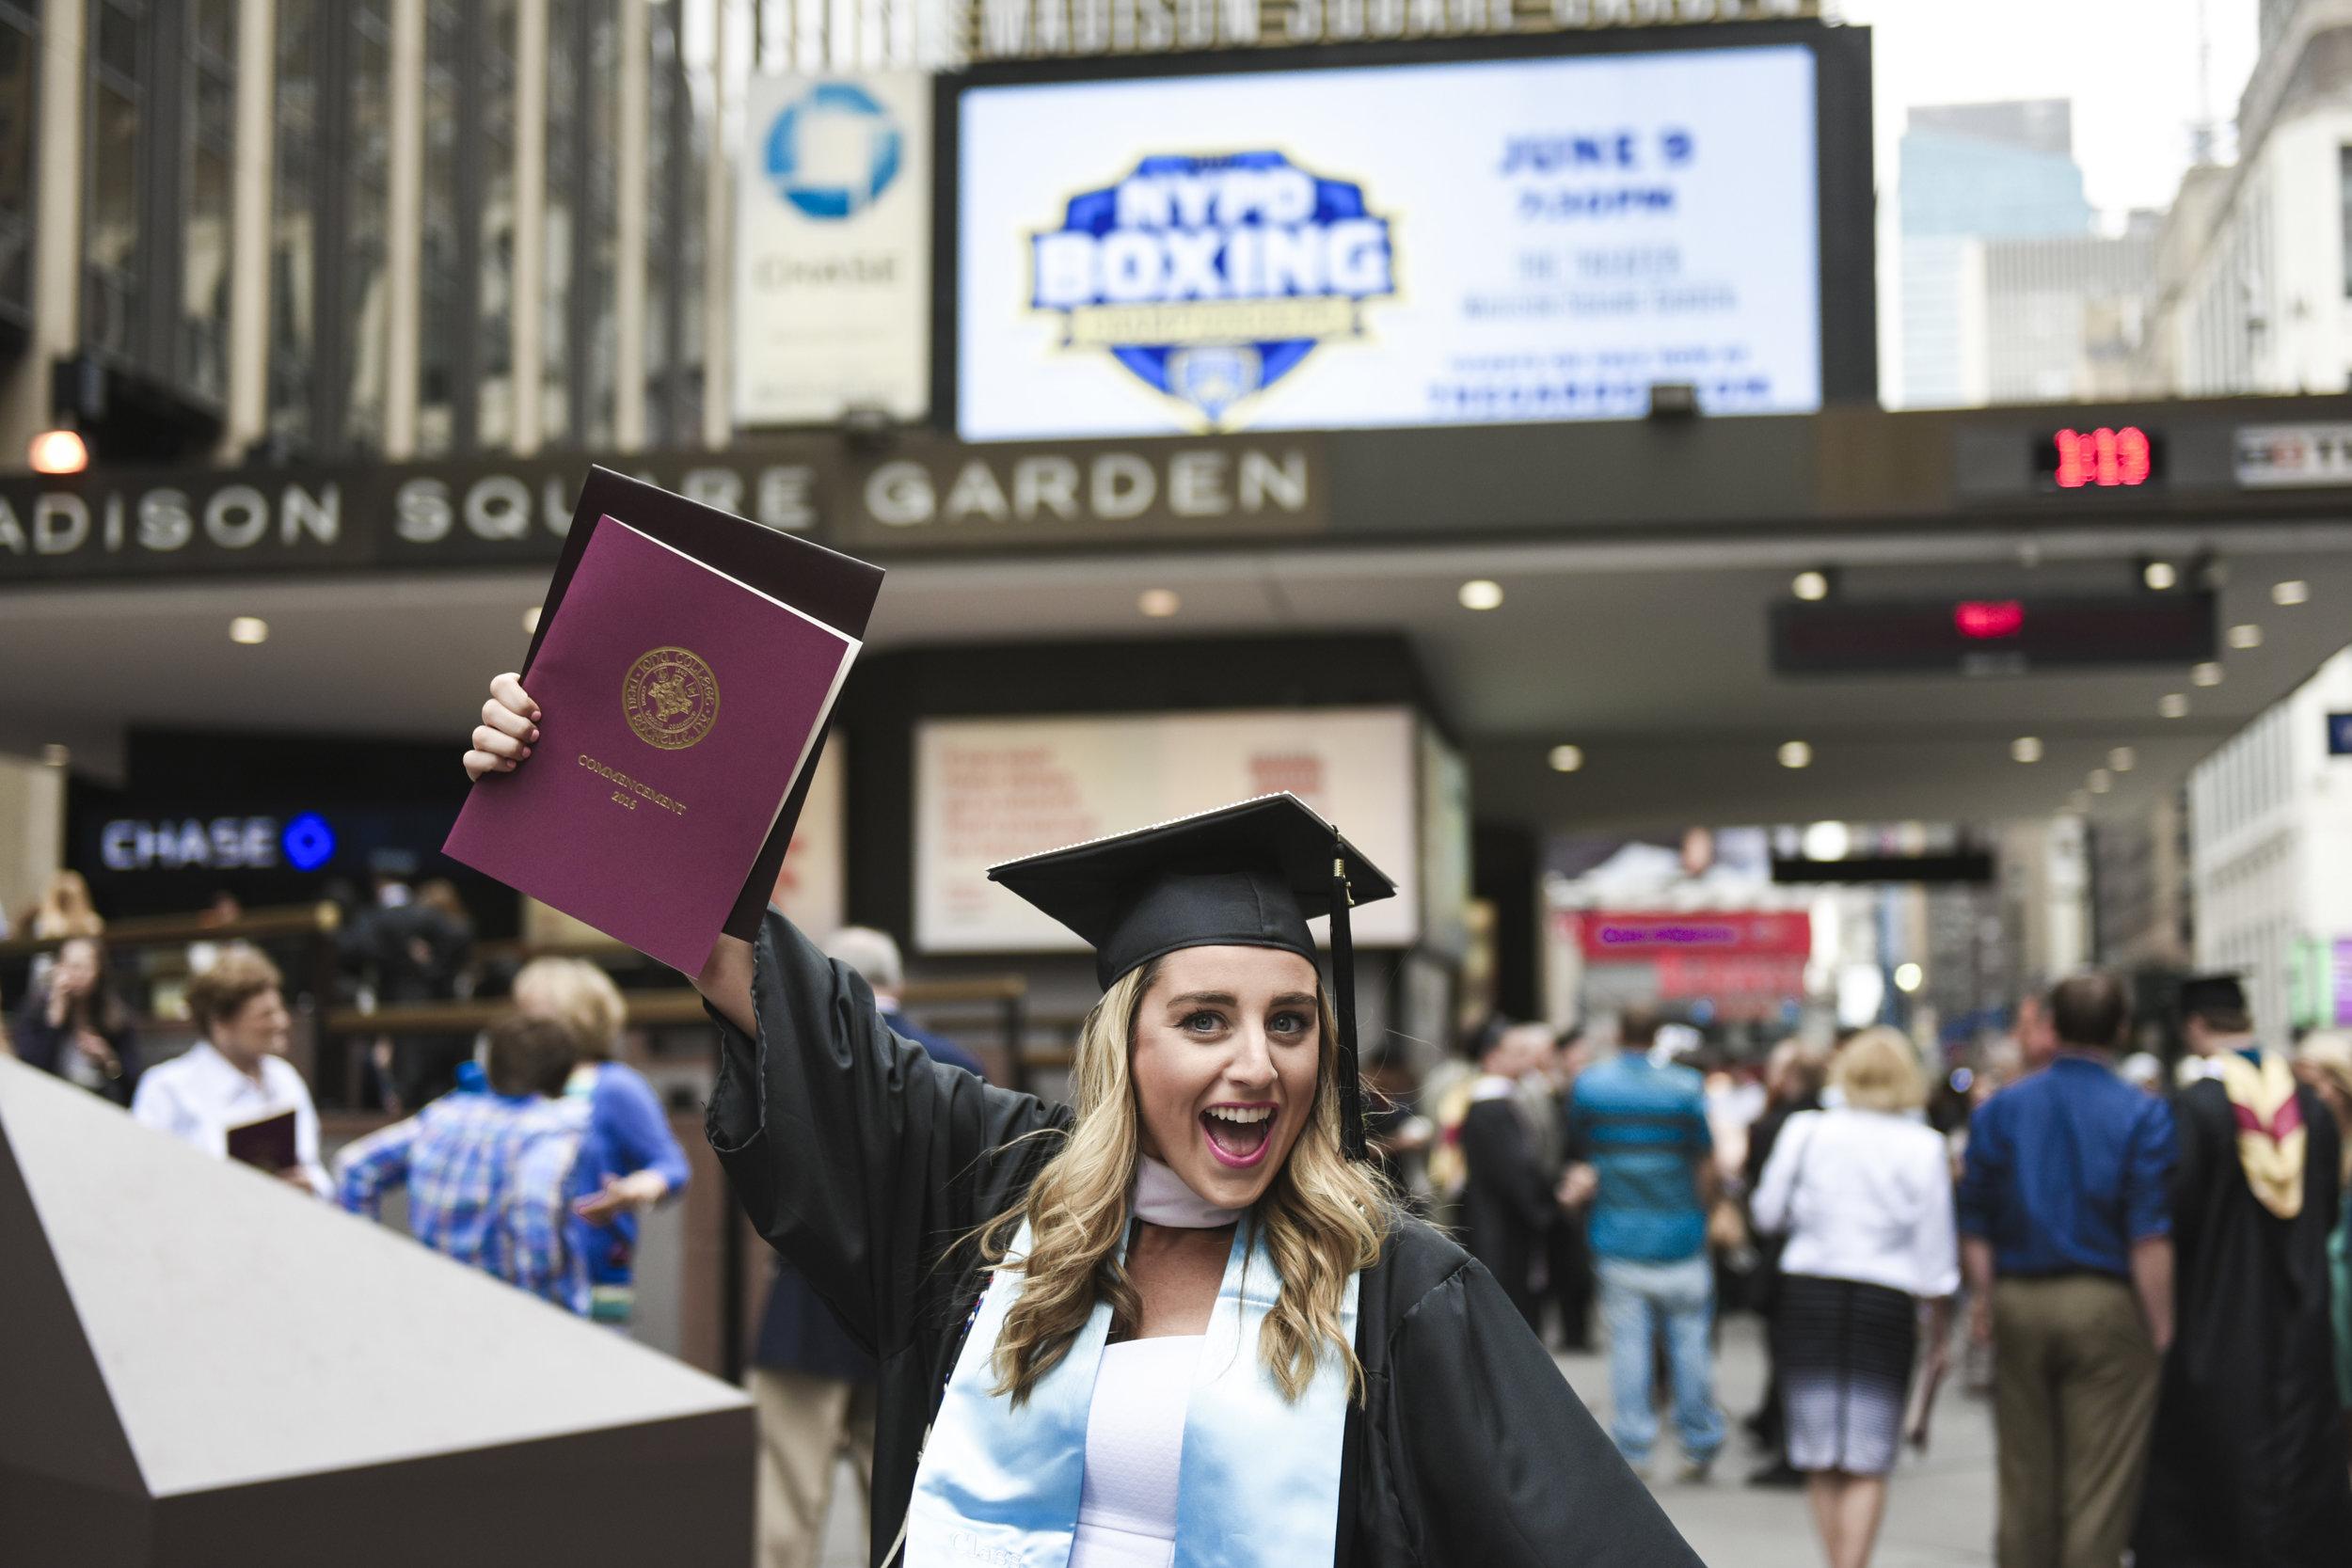 Rachel's graduation at Madison Square Garden